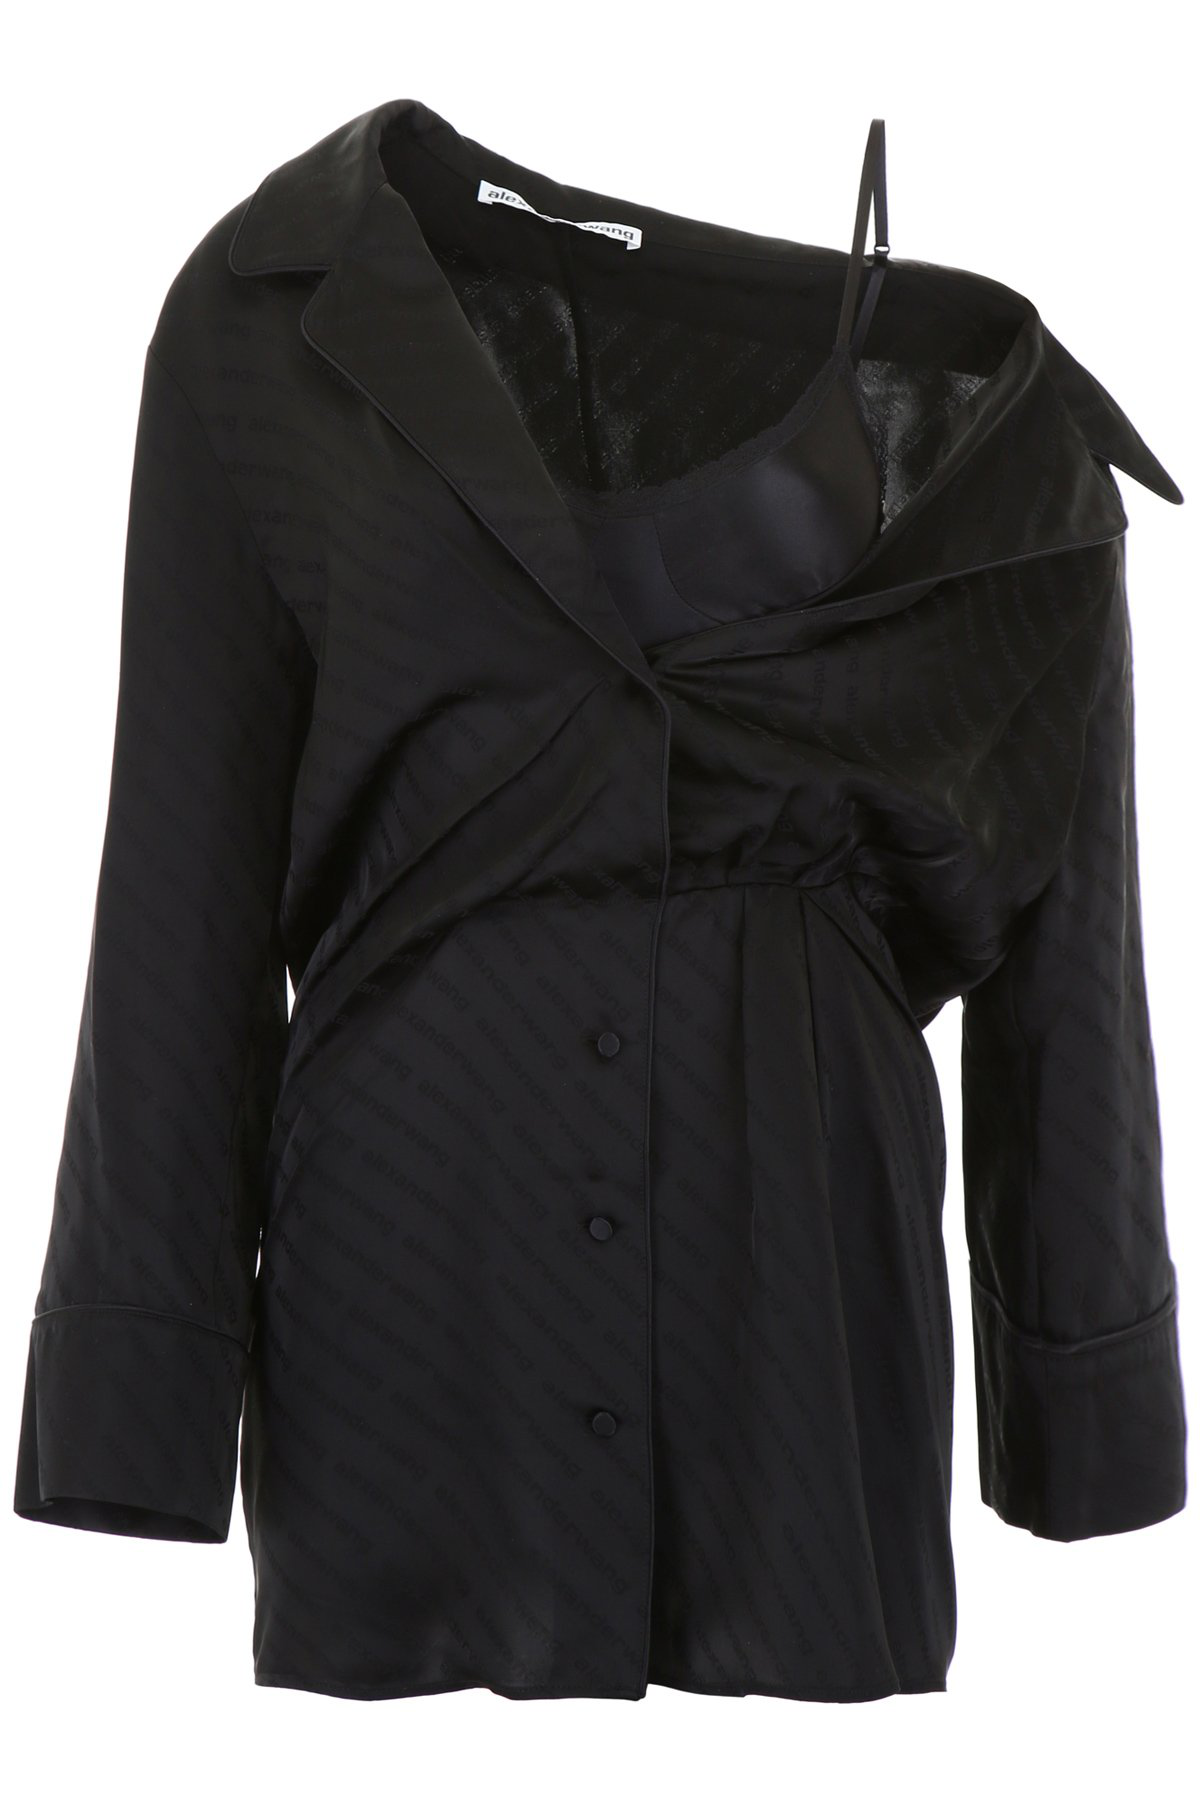 7701b0671e1 Alexander Wang Draped Lace-Trimmed Silk-Blend And Satin-Jacquard Mini Dress  In